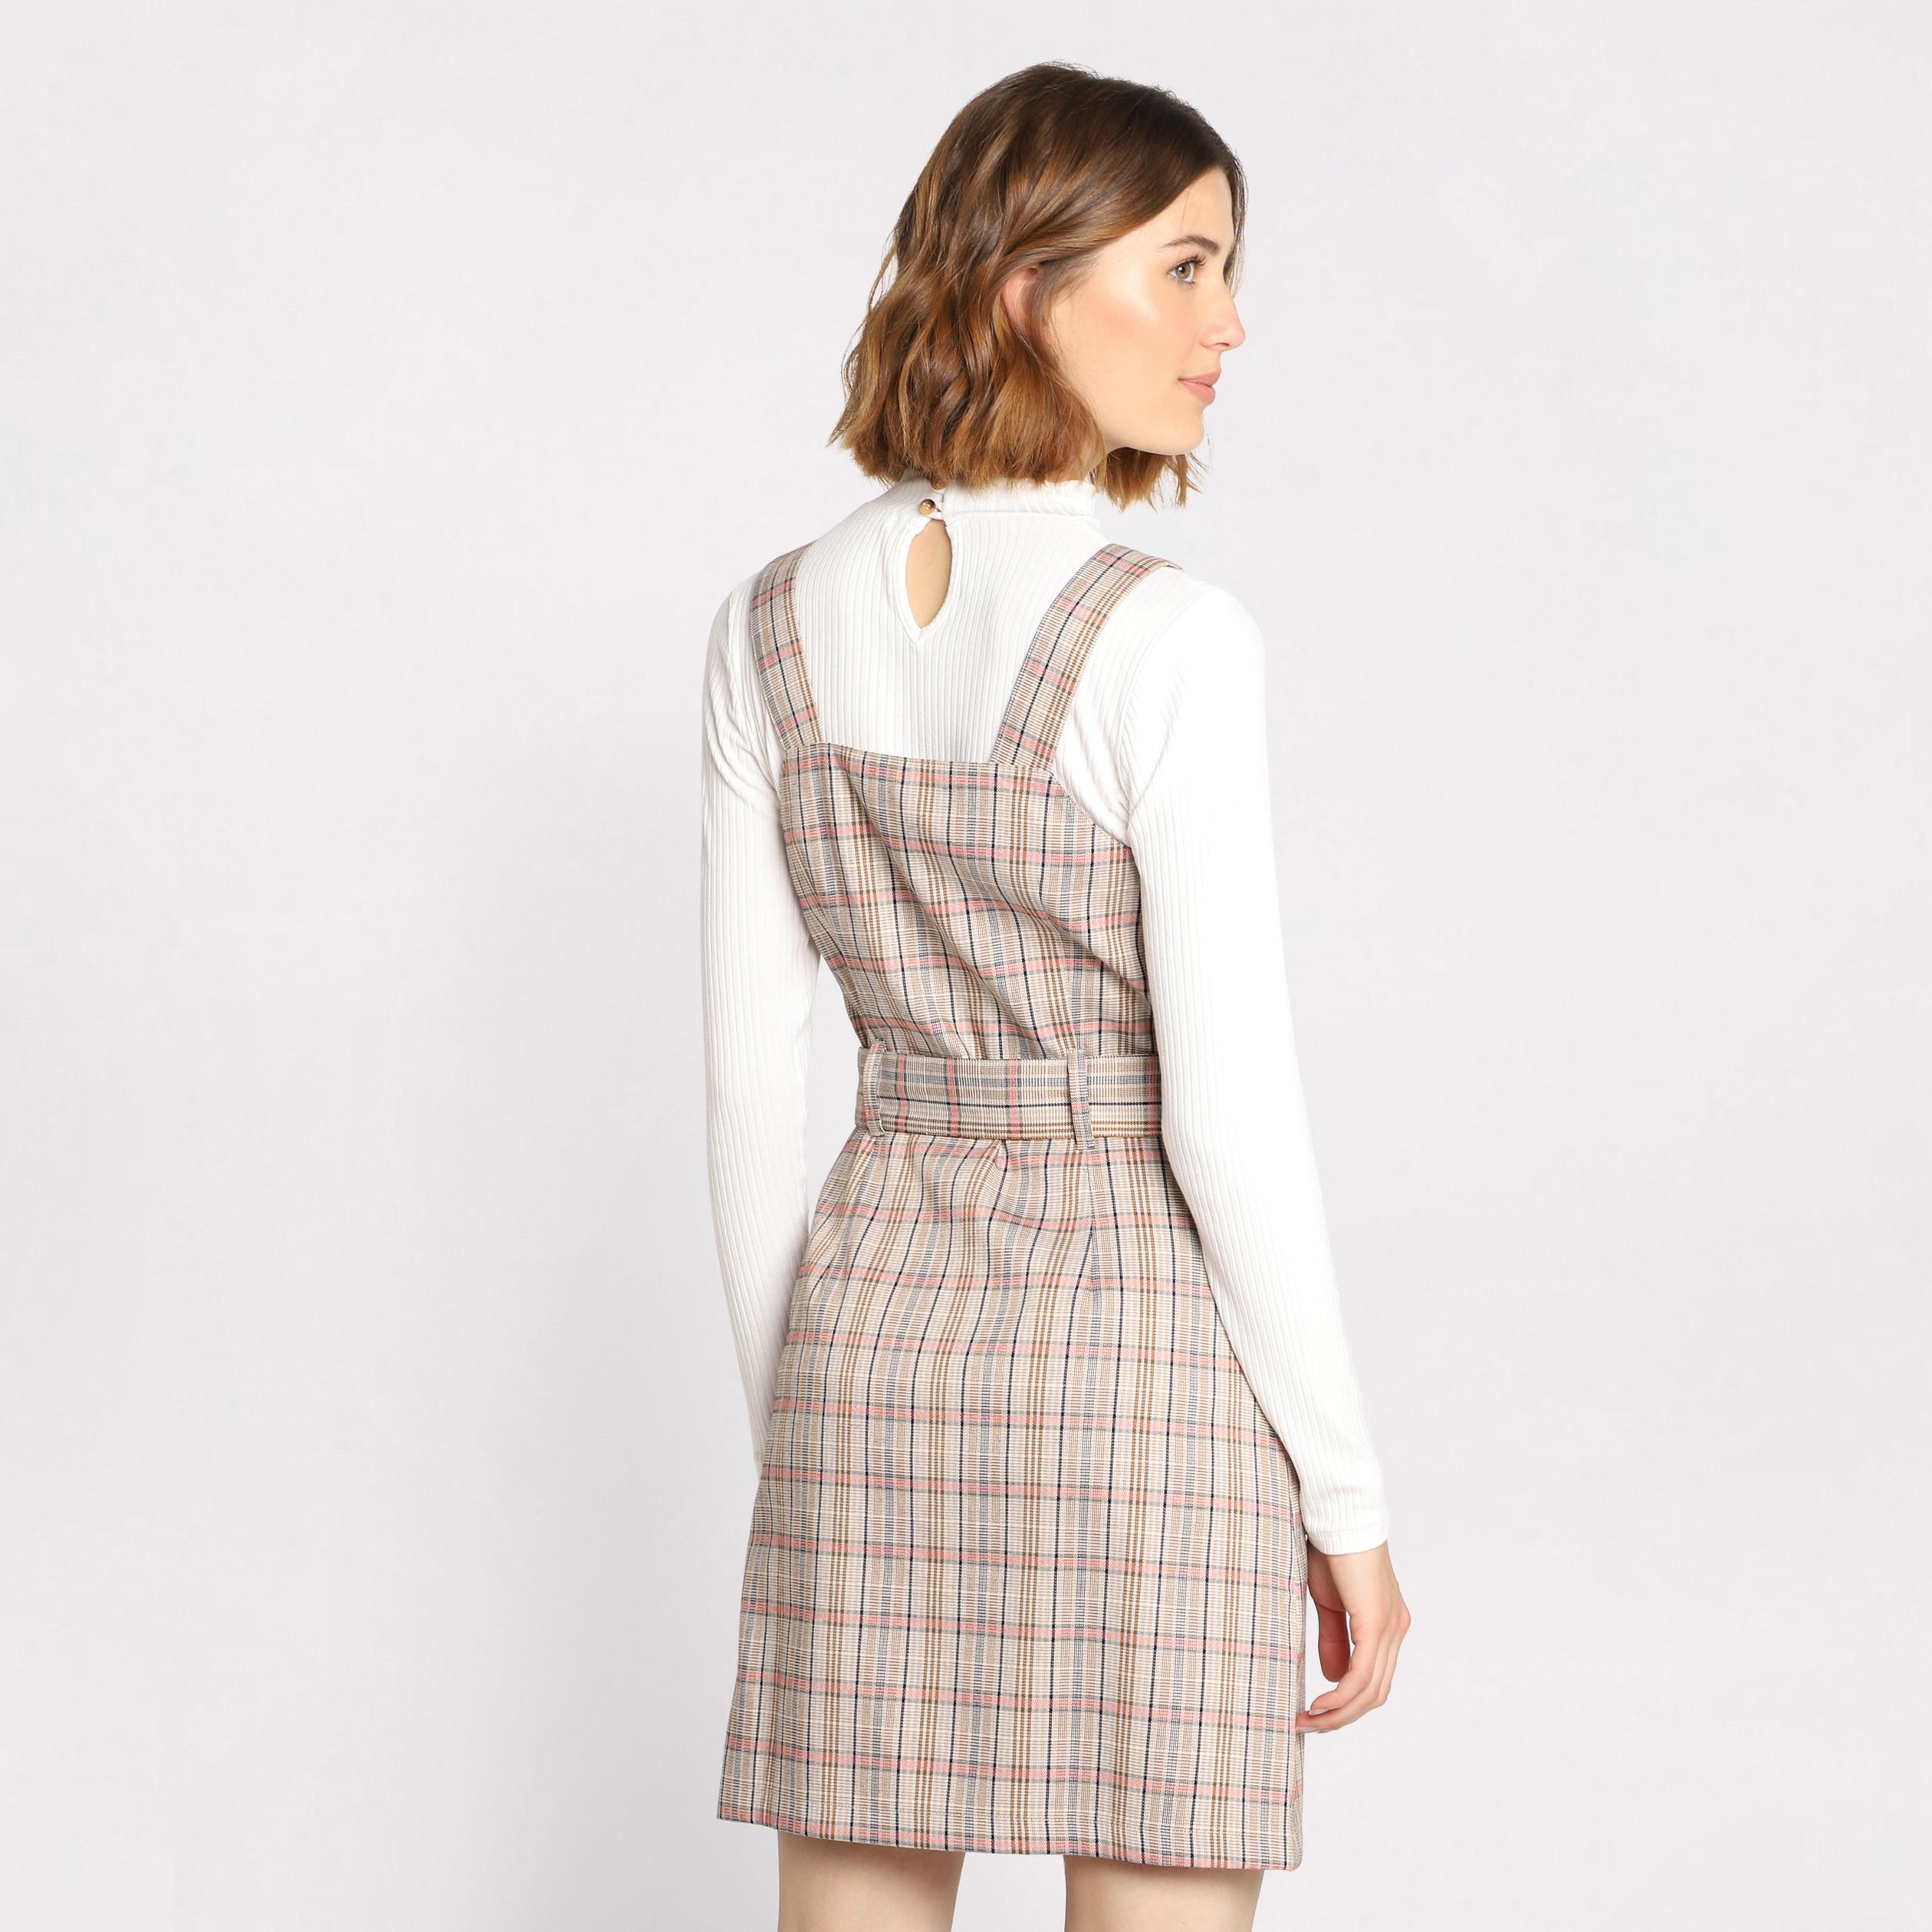 091003dcfbb457 Robe salopette à ceinture beige femme